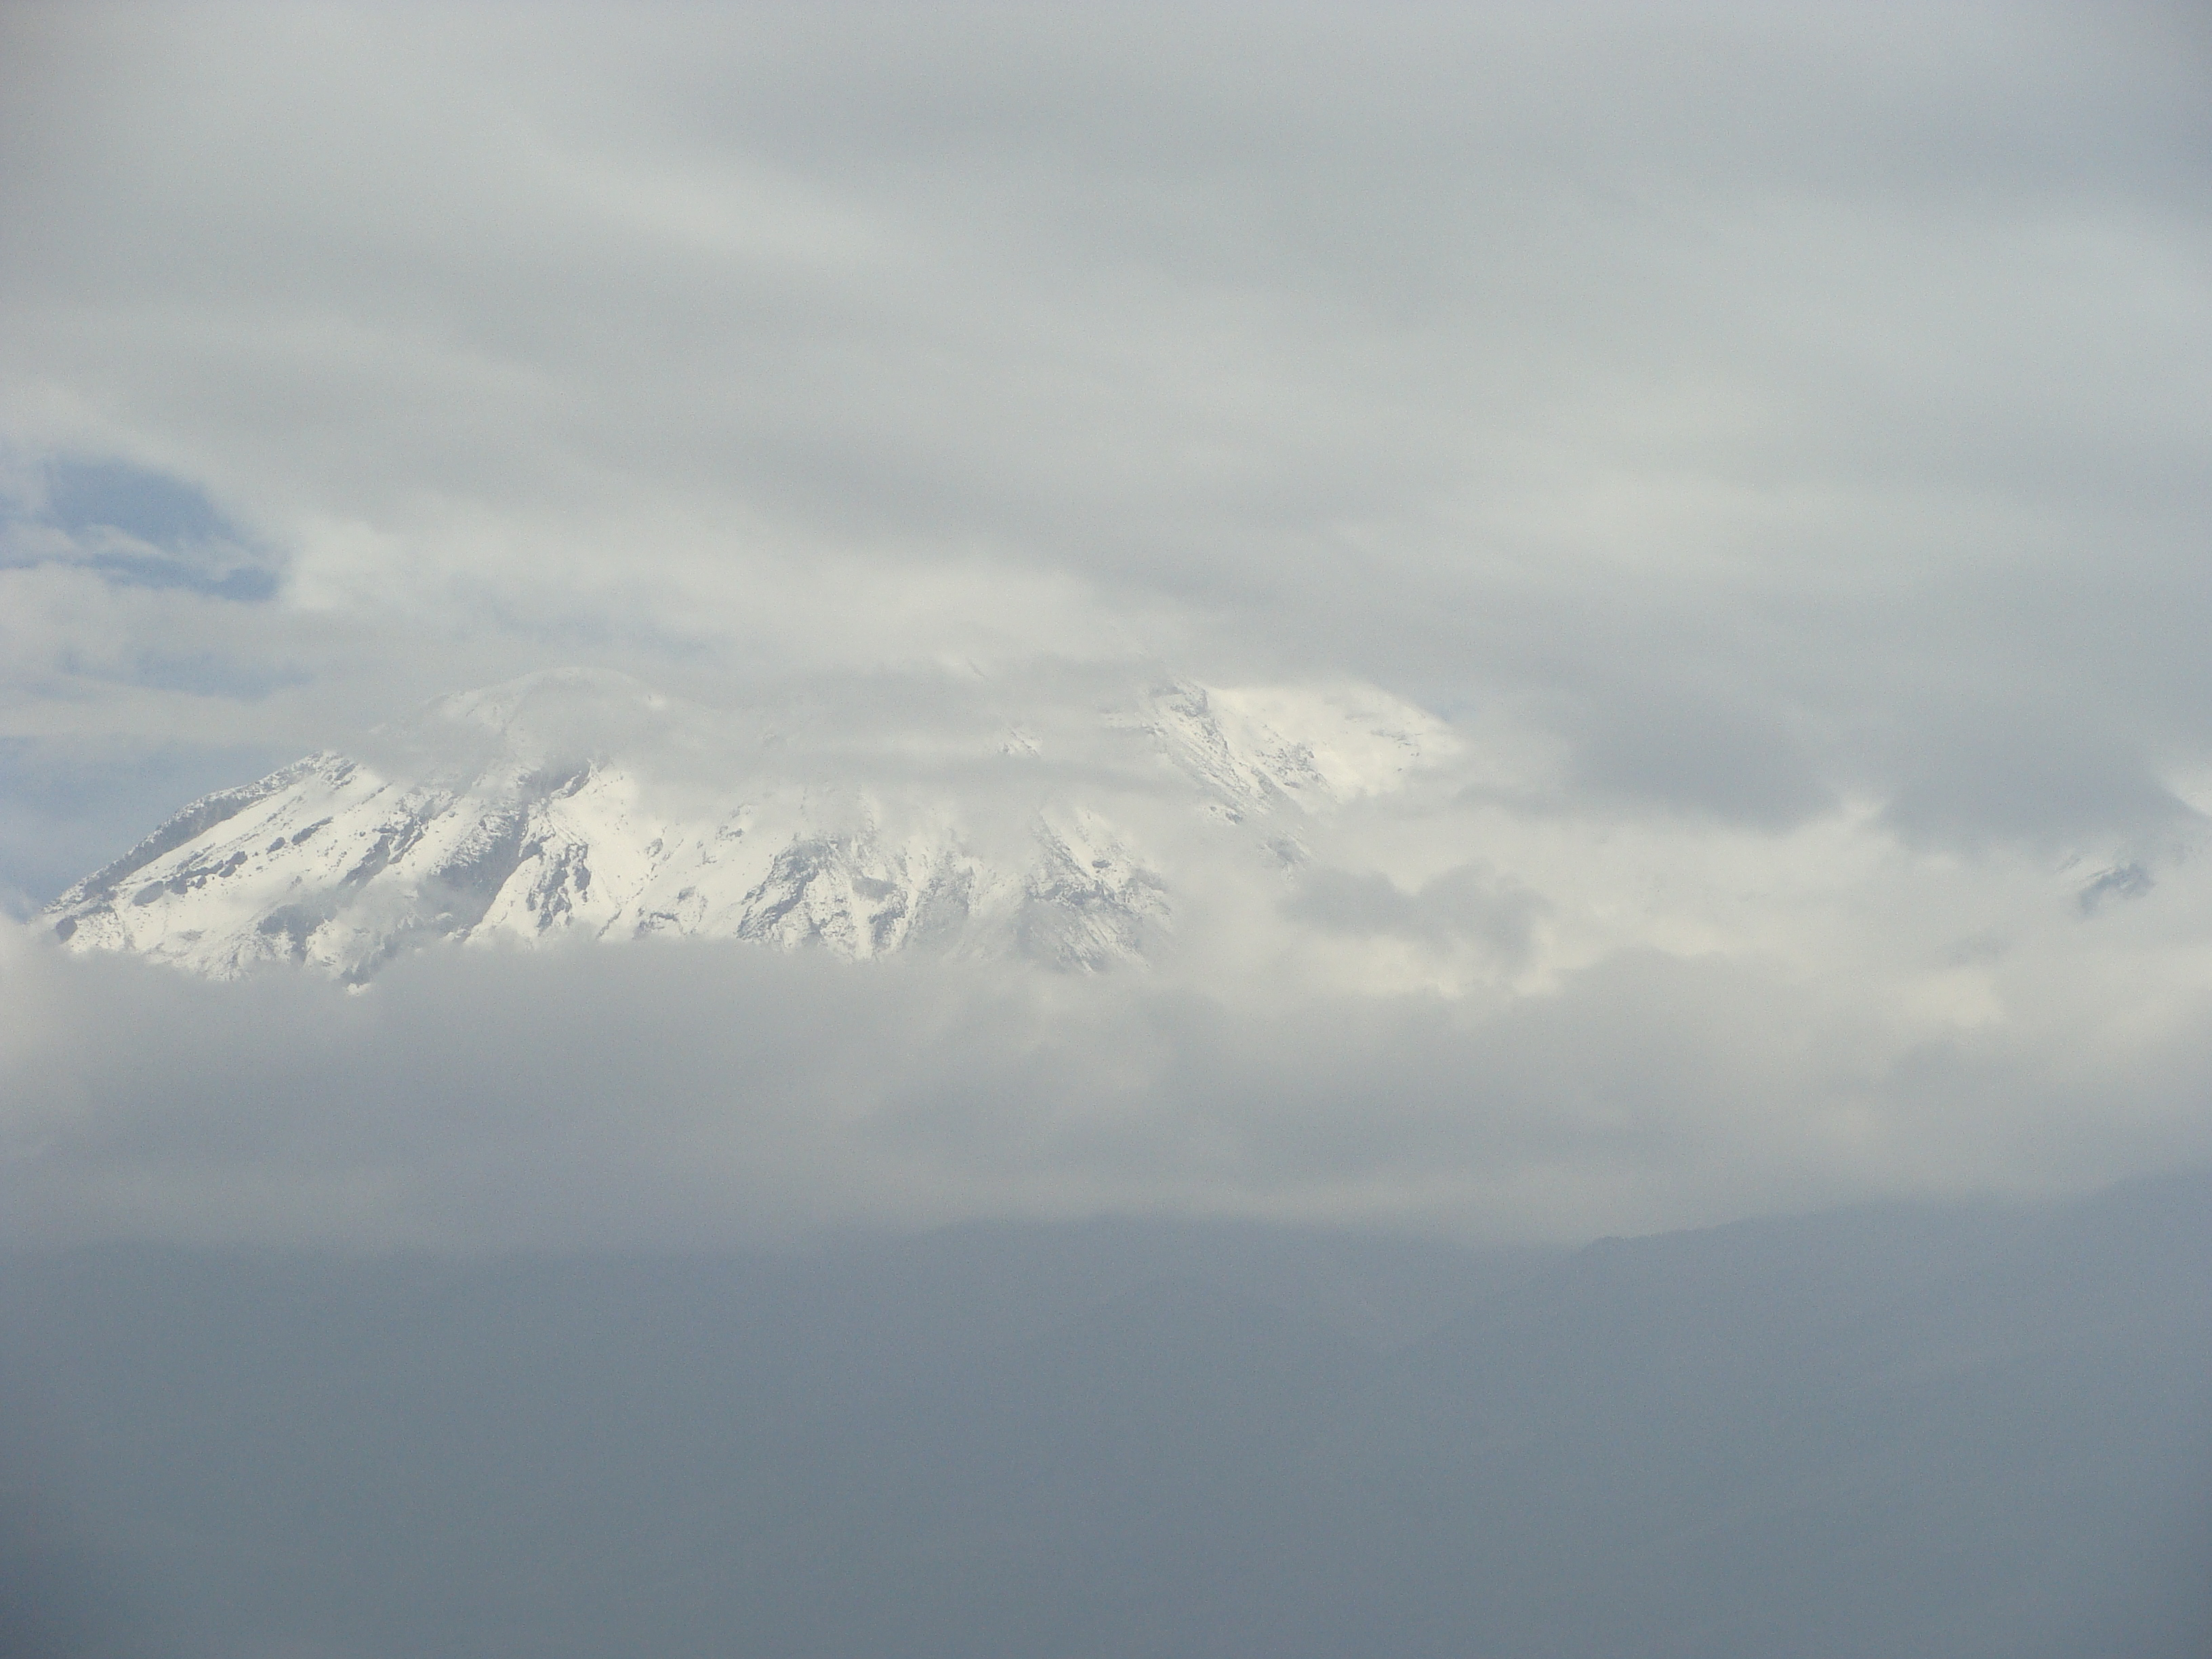 Arequipa - Reserva Nacional Salinas - Aguada Blanca - vulkán Chachani dne 20.2.2012 10:15.